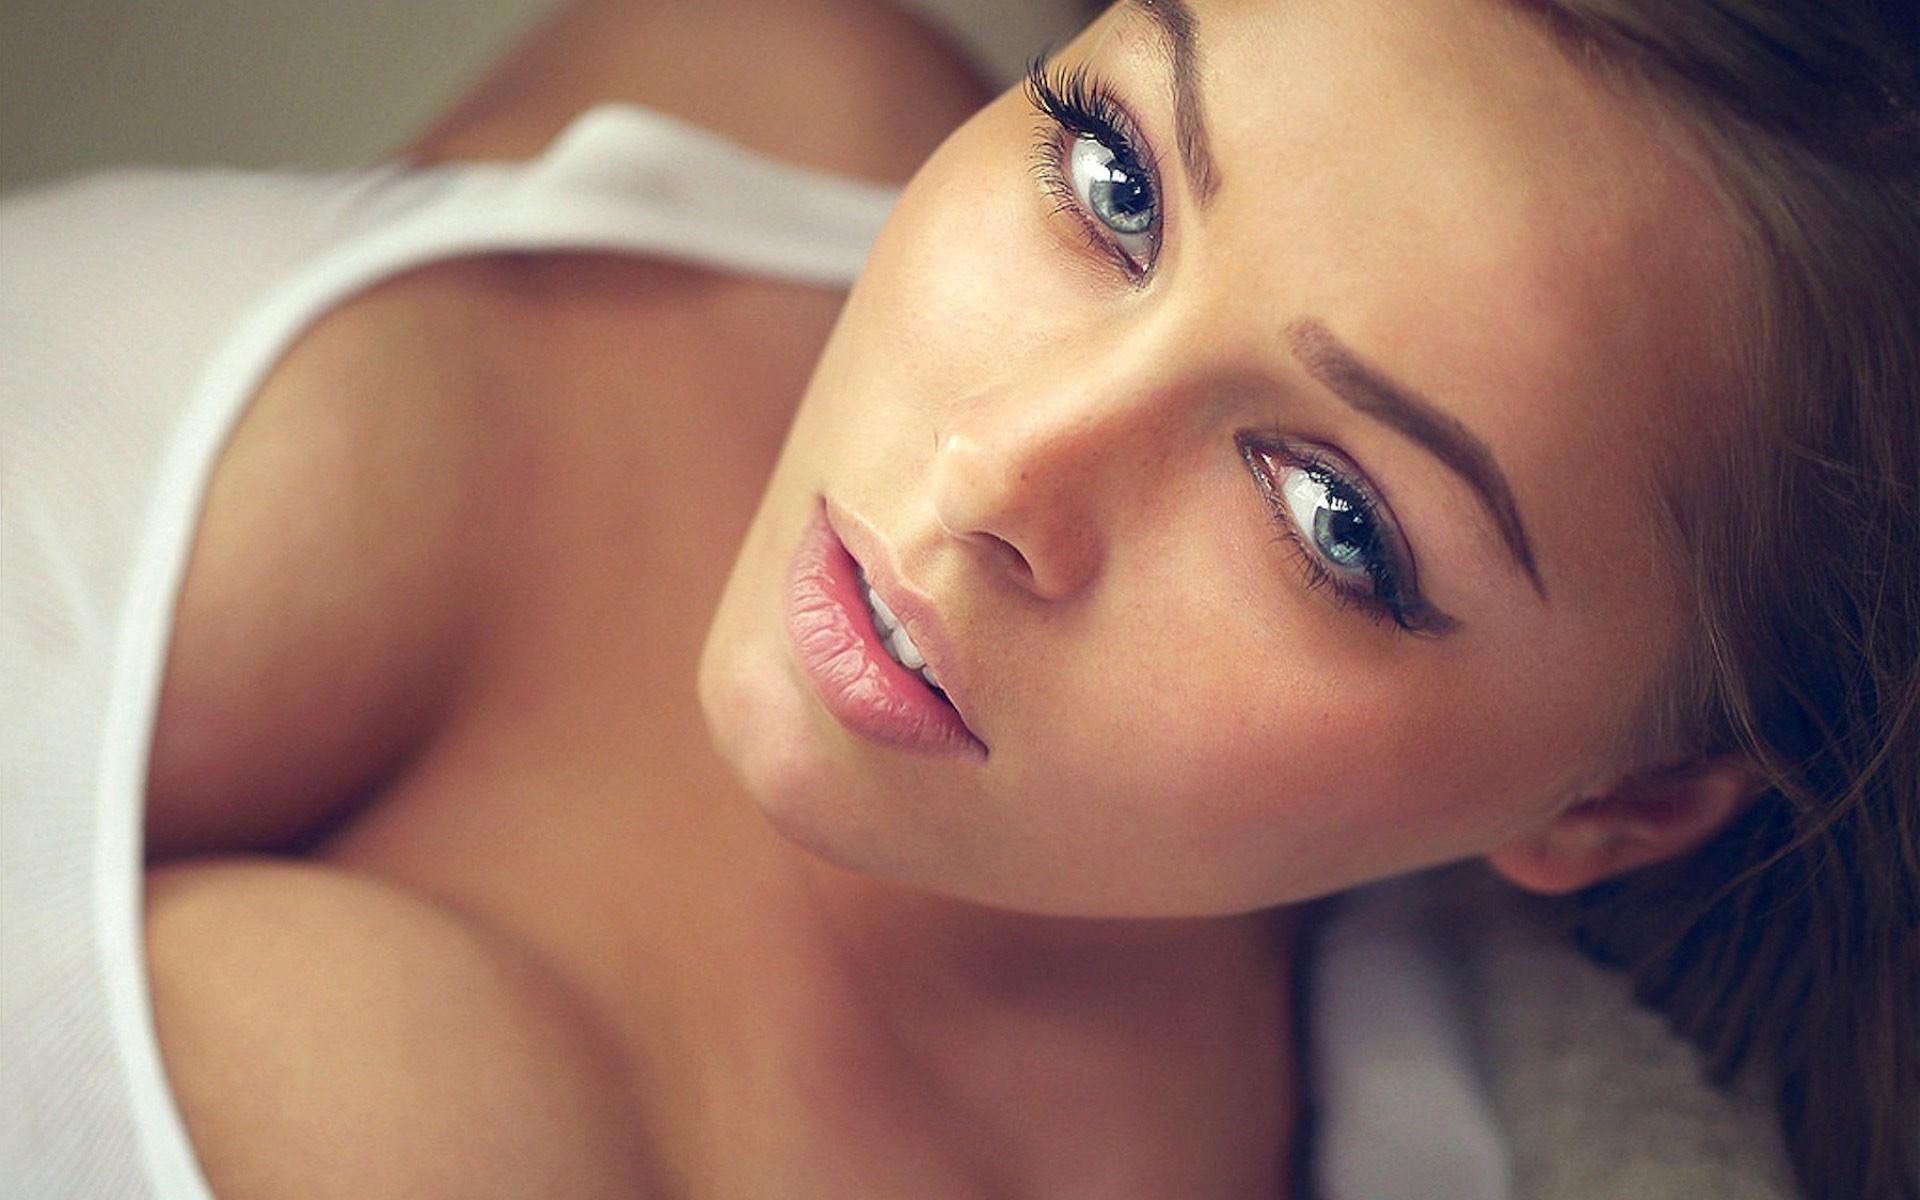 blue eyes wallpaper 2048x1152 - photo #34